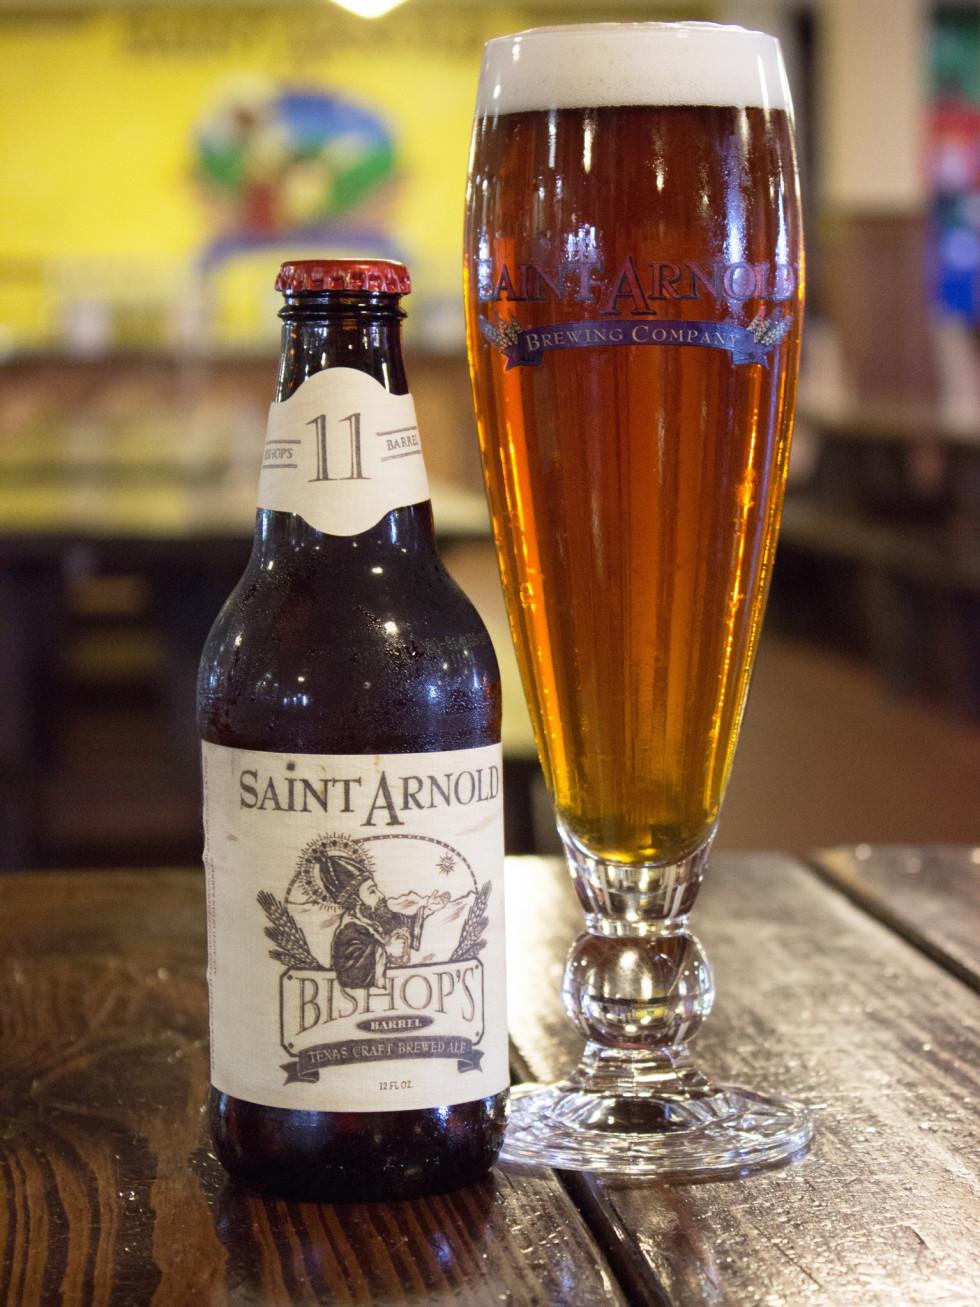 Saint Arnold Bishop's Barrel 11 glass